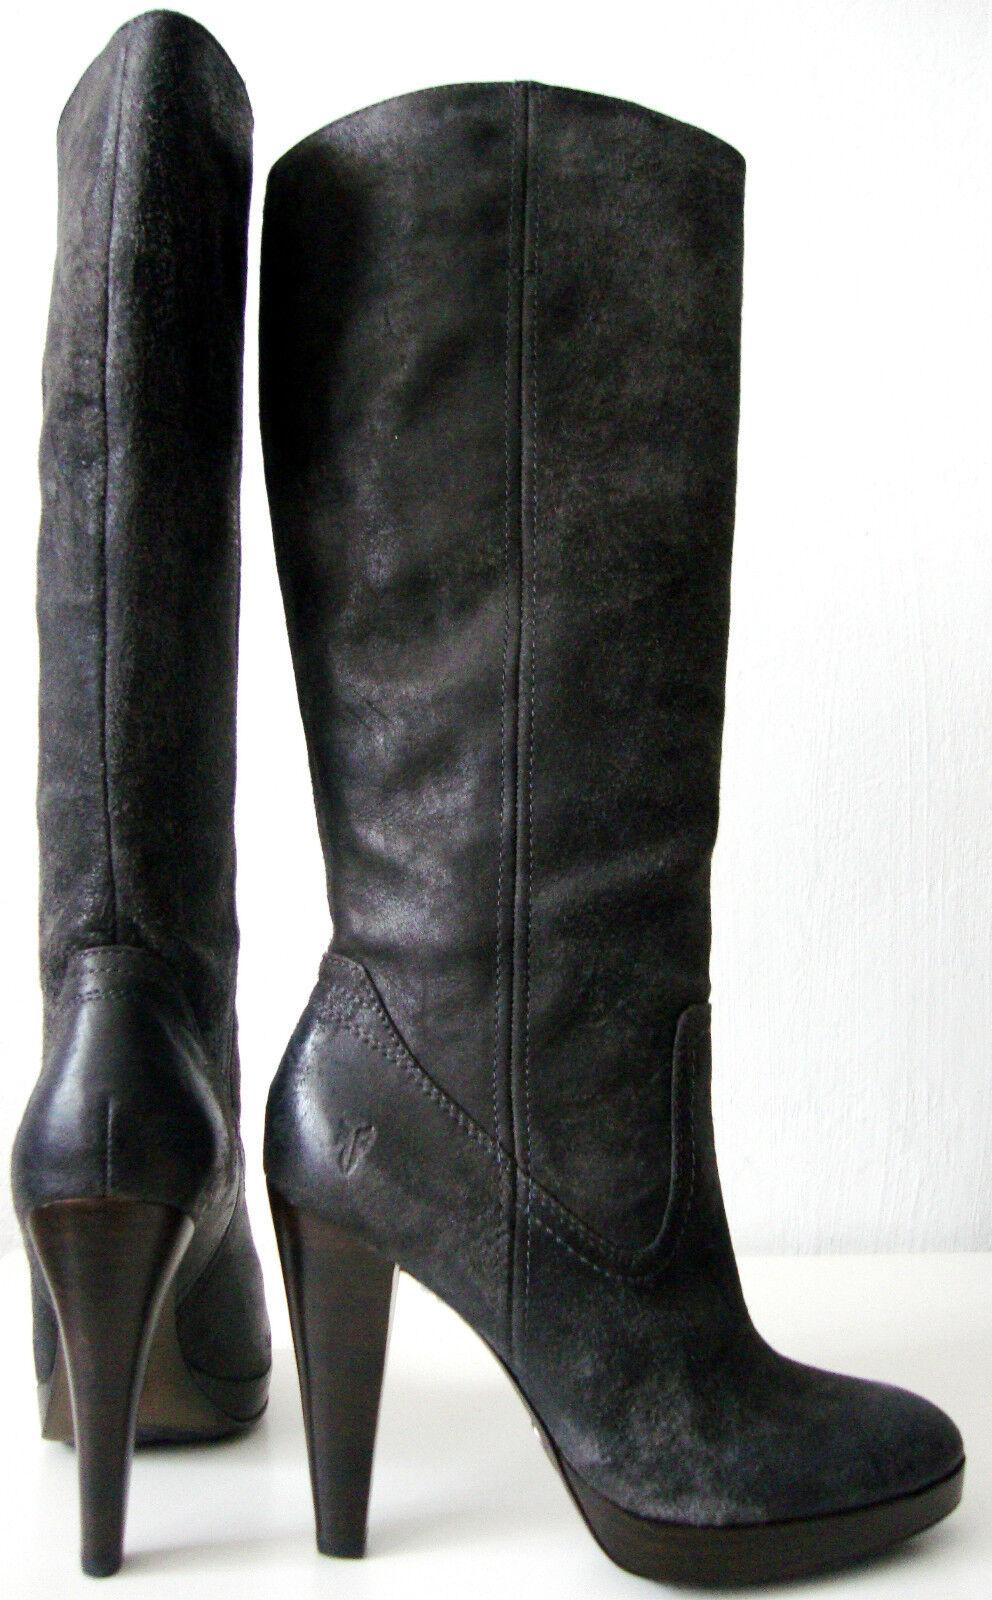 FRYE HARLOW CAMPUS Stiefel Damen Leder High Heel Luxus Stiefel Grau Gr.37   7M NEU